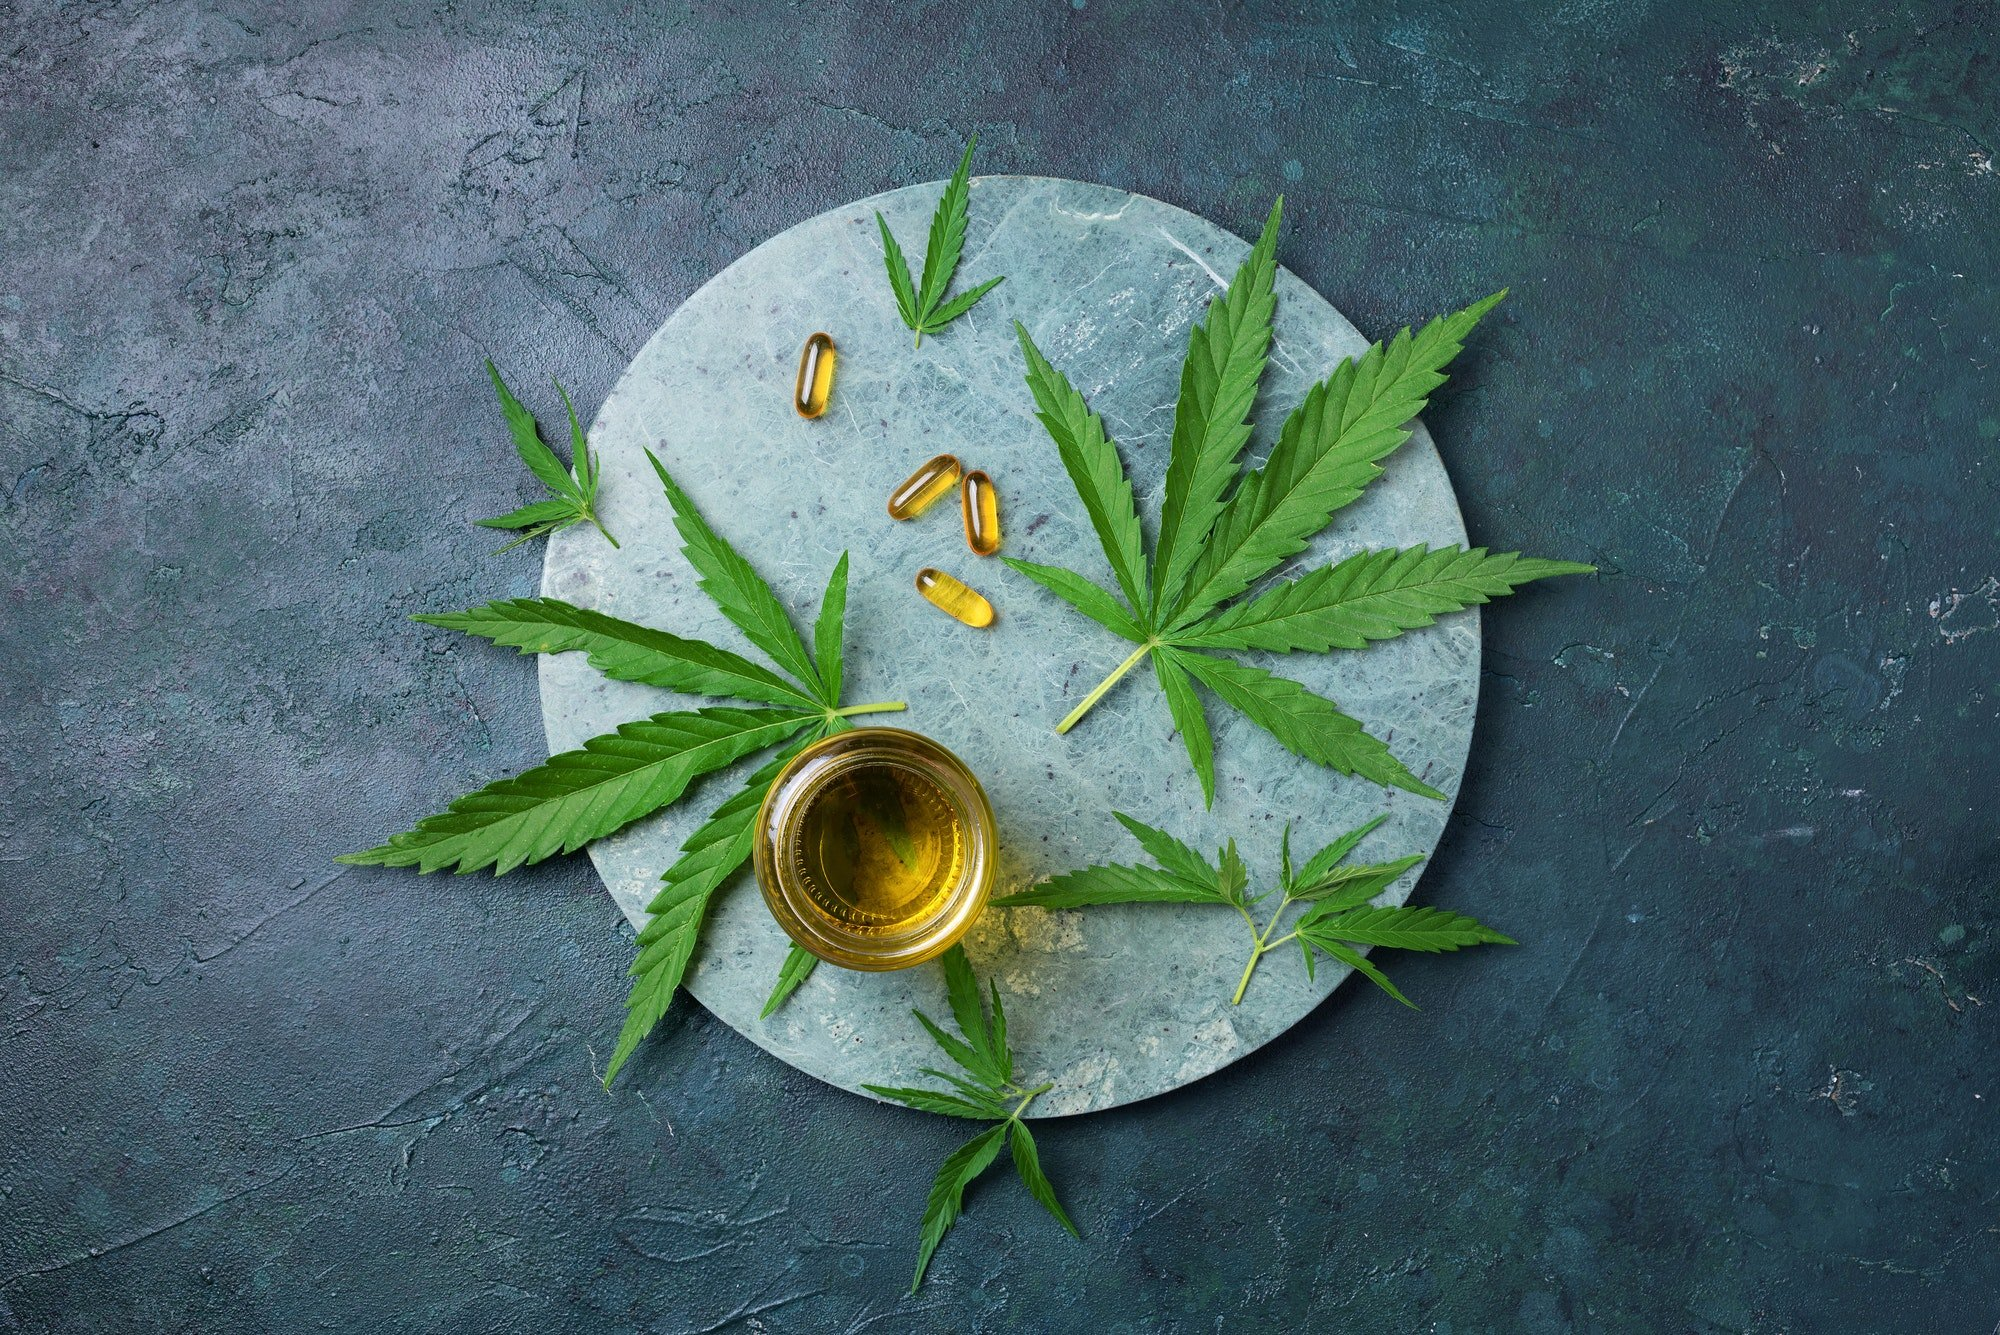 CBD oil, hemp oil capsules and cannabis leaves on dark background. Flat lay, copy space. Cosmetics